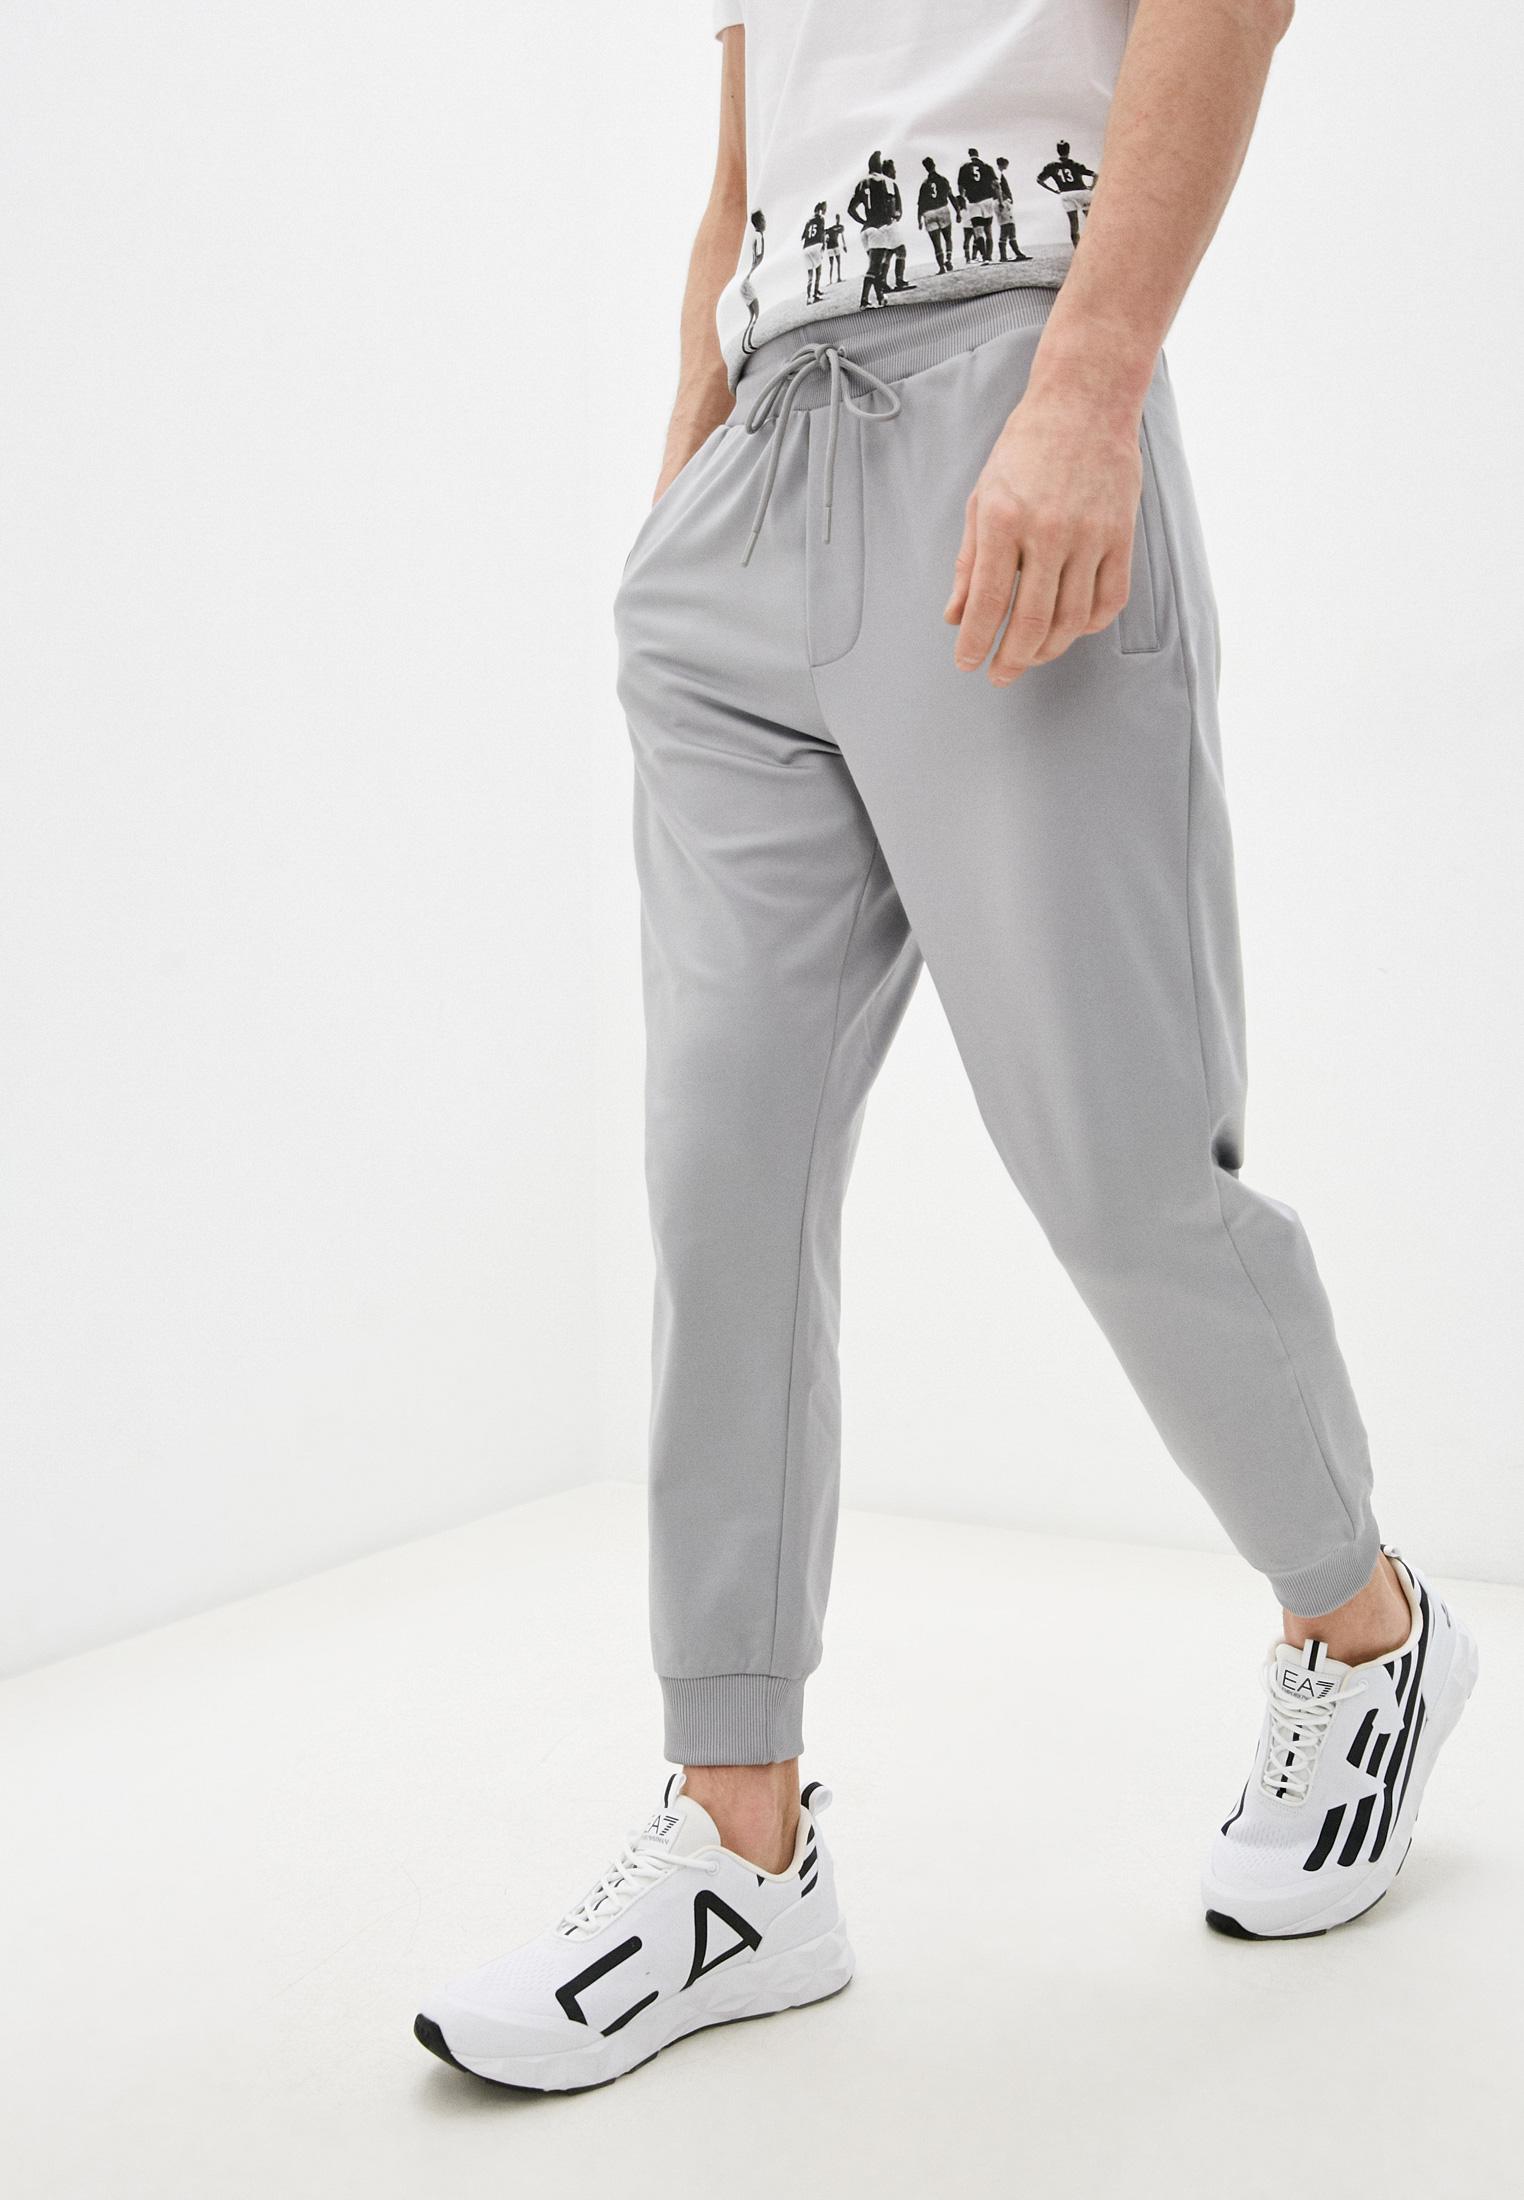 Мужские спортивные брюки Bikkembergs (Биккембергс) C183CGSEB010